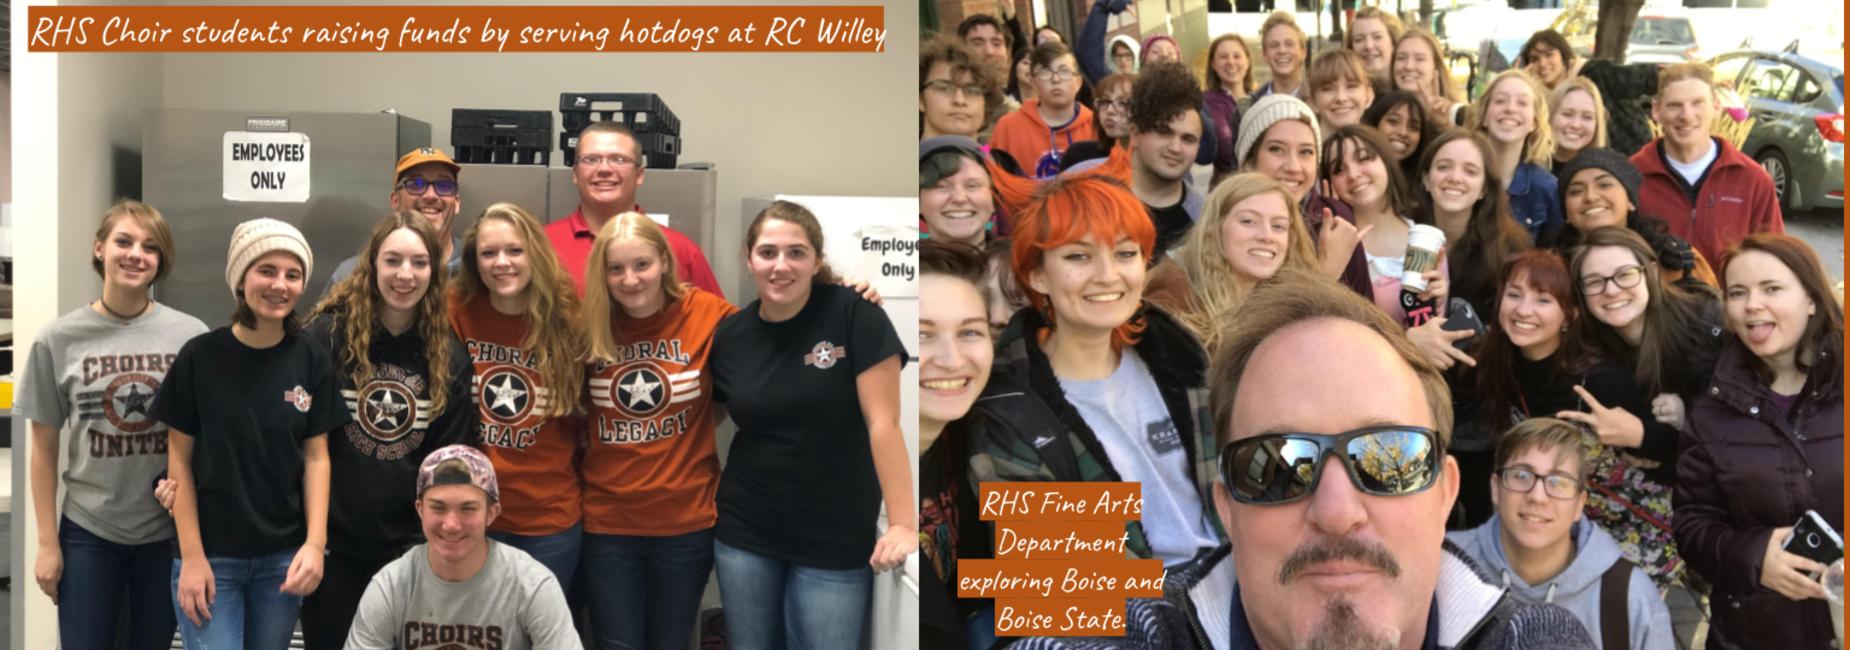 RHS Choir Students  serving hotdogs and Fine Arts Department exploring Boise